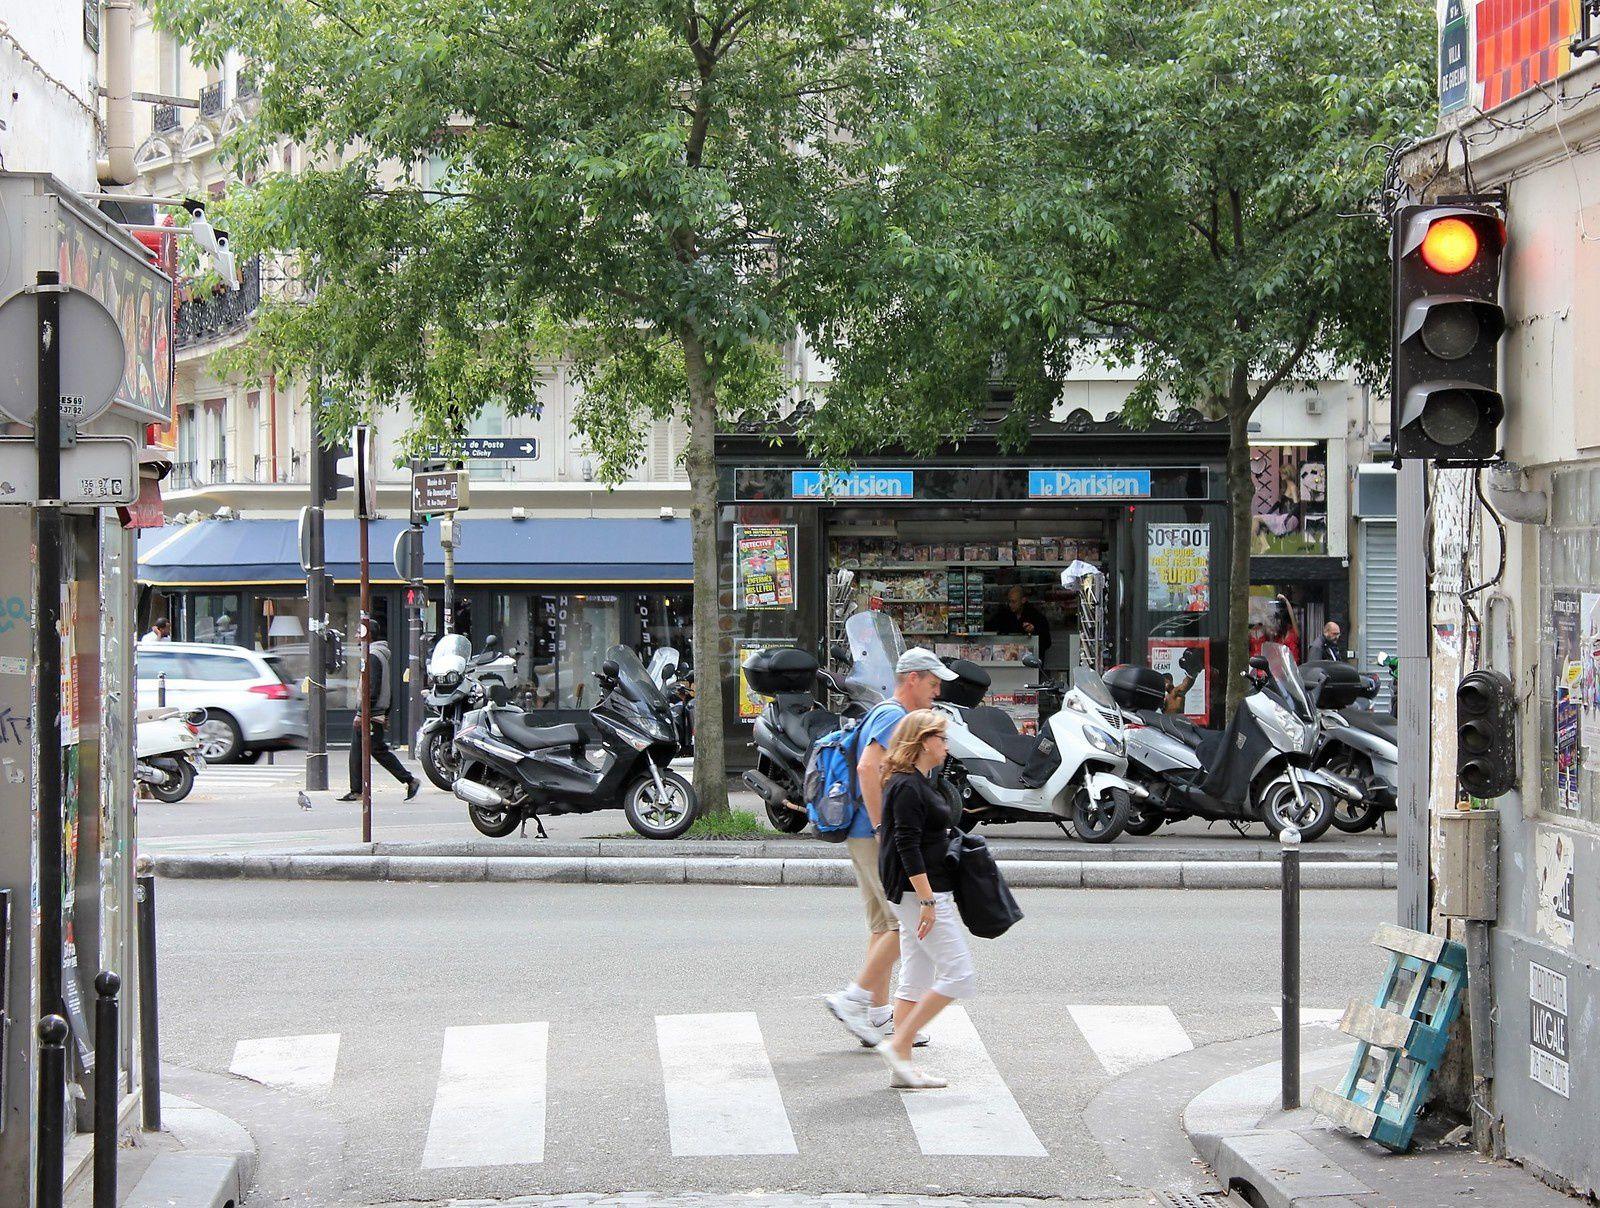 Vers le boulevard de Clichy.